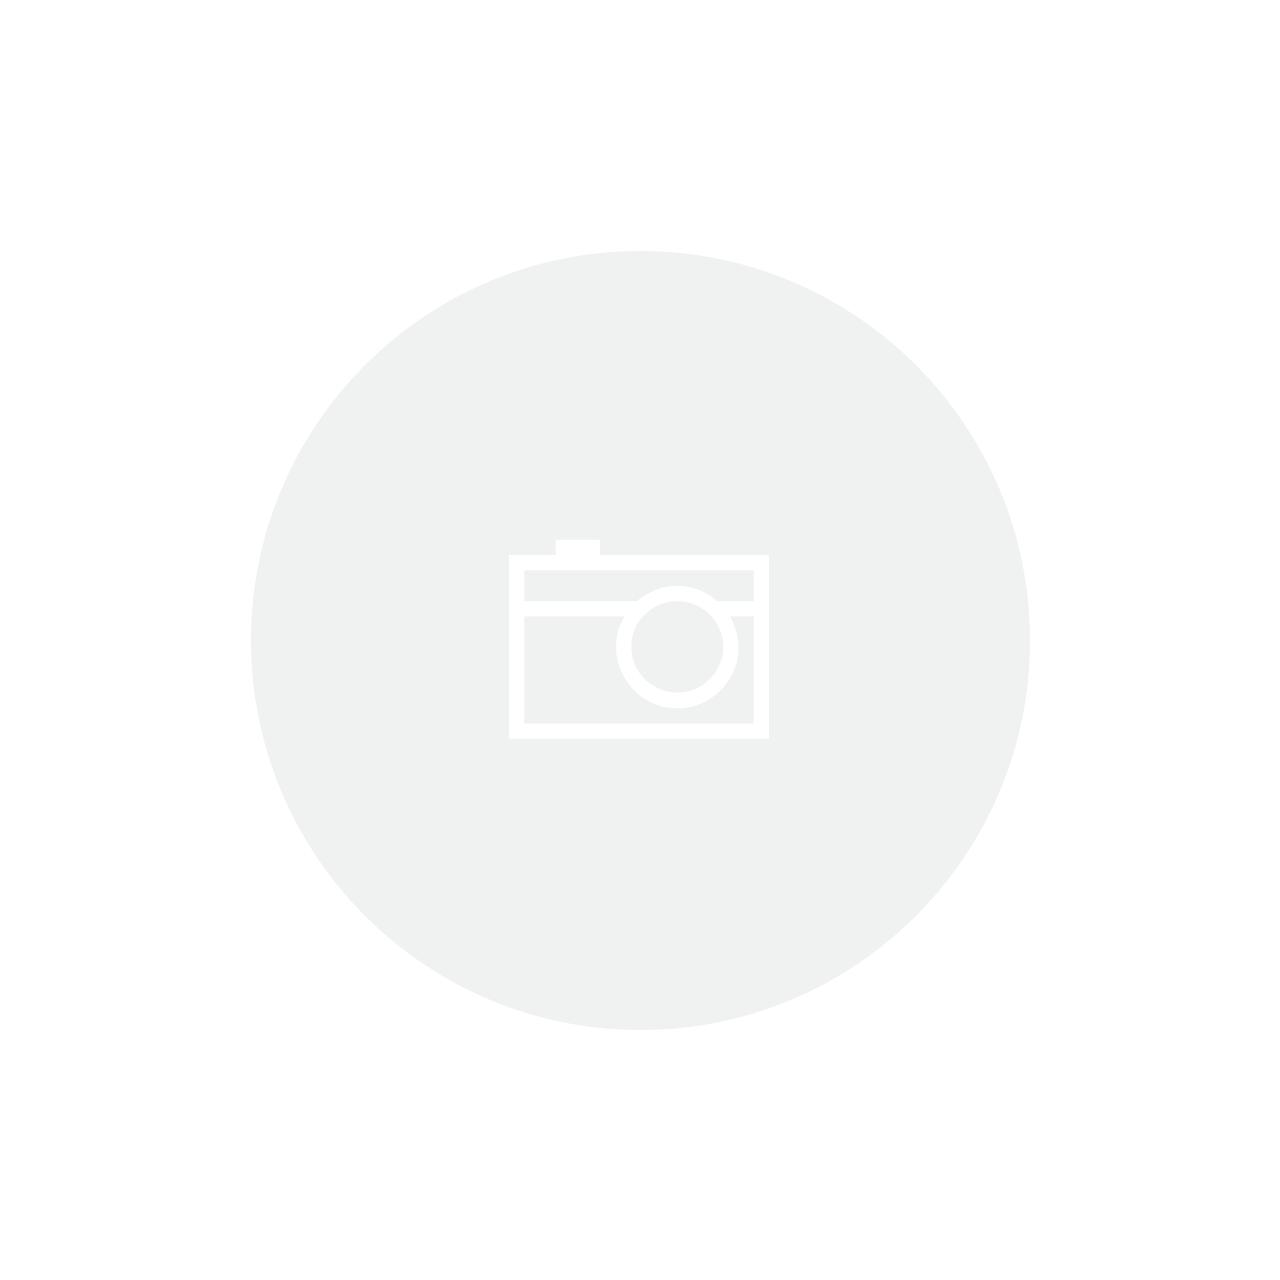 VISTA LIGHT SUPER LED ABSOLUTE JY-6018T TRAS. RECAR. USB